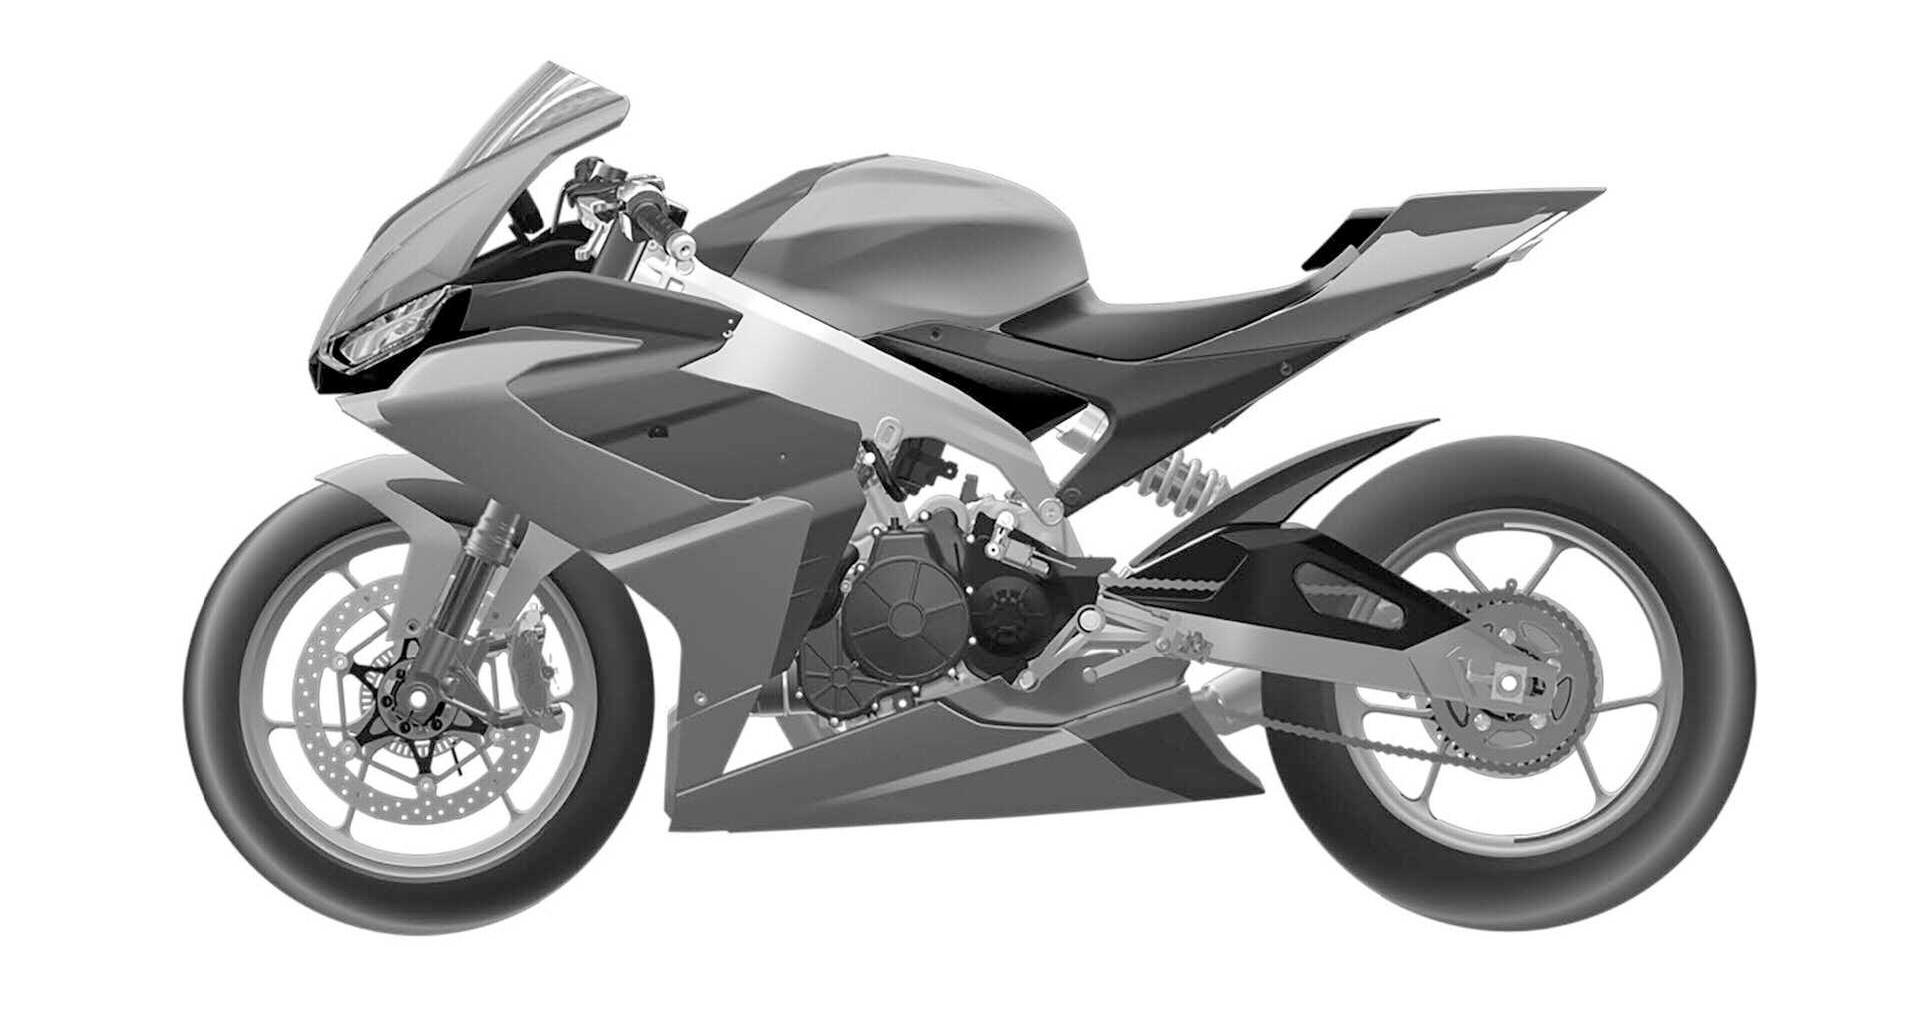 053019-2020-aprilia-rs660-concept-design-left-side-e1559255668628